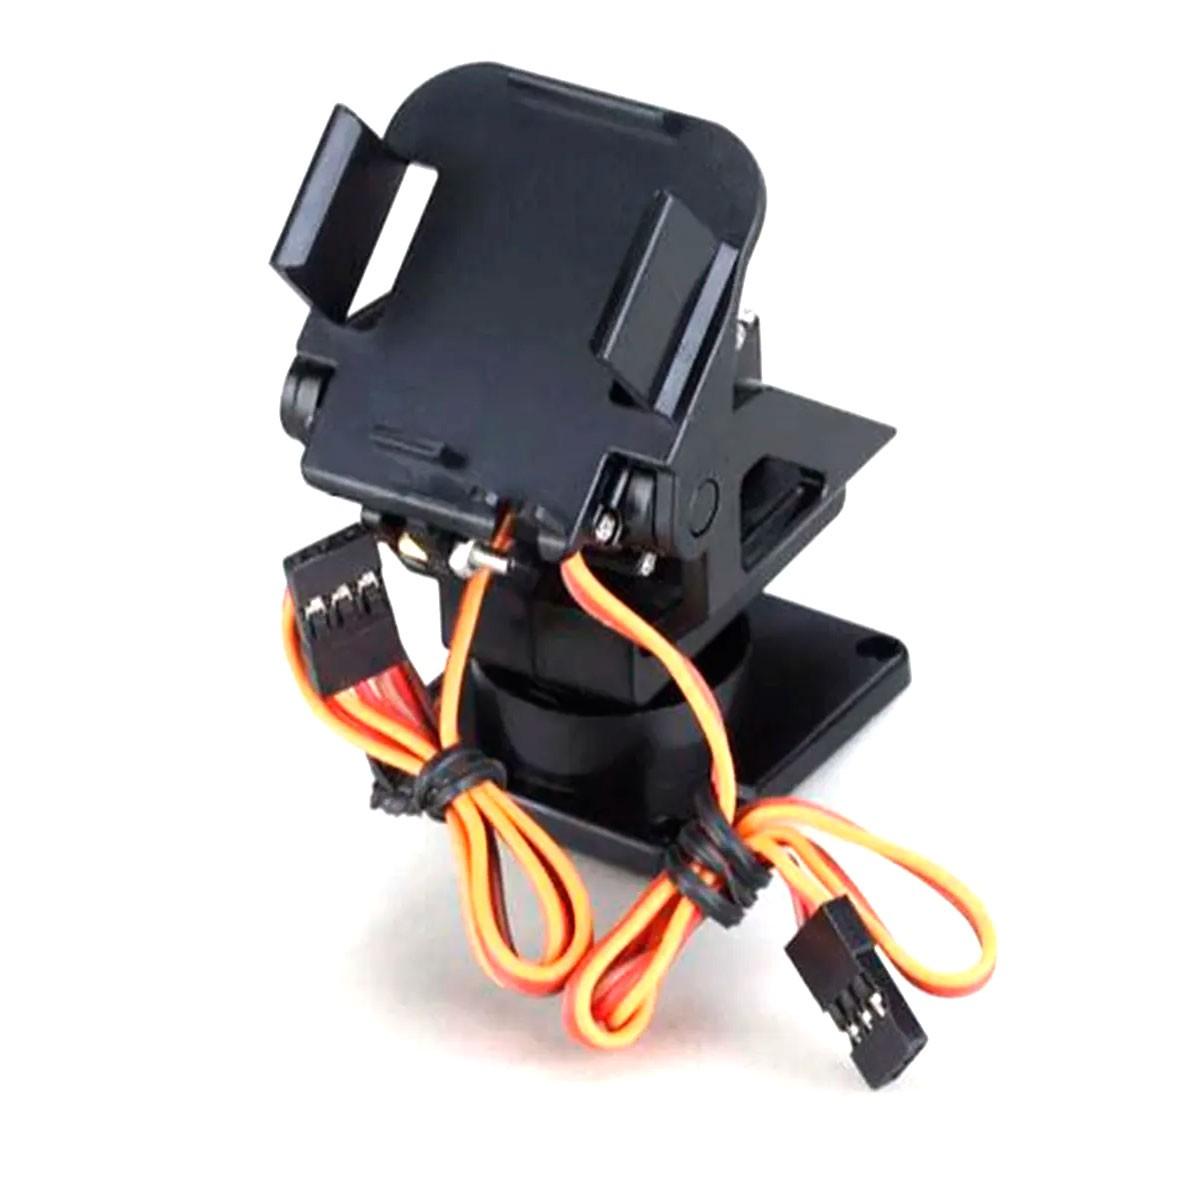 Pan Tilt FPV de Câmera | Gimbal Drone - Sem Servos